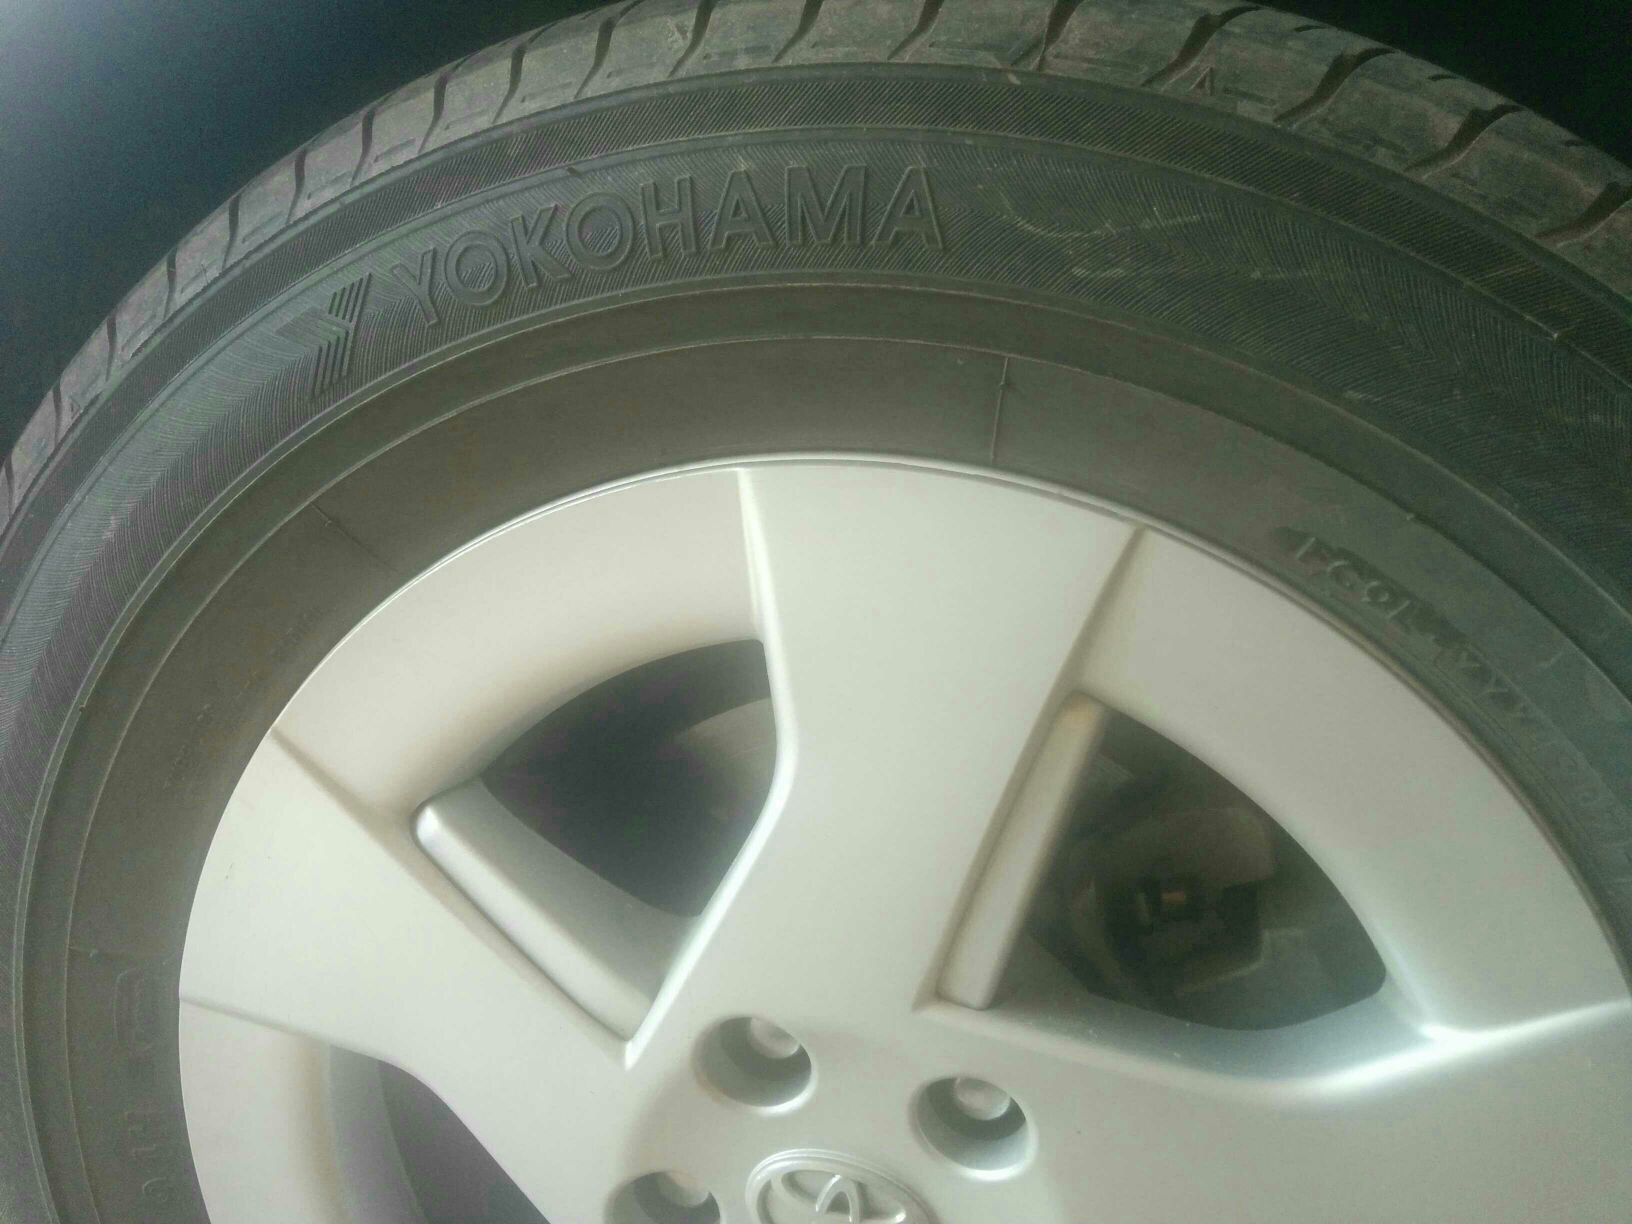 Toyota Prius fan club - aba640232ae8747501bfb8d31d33be9c